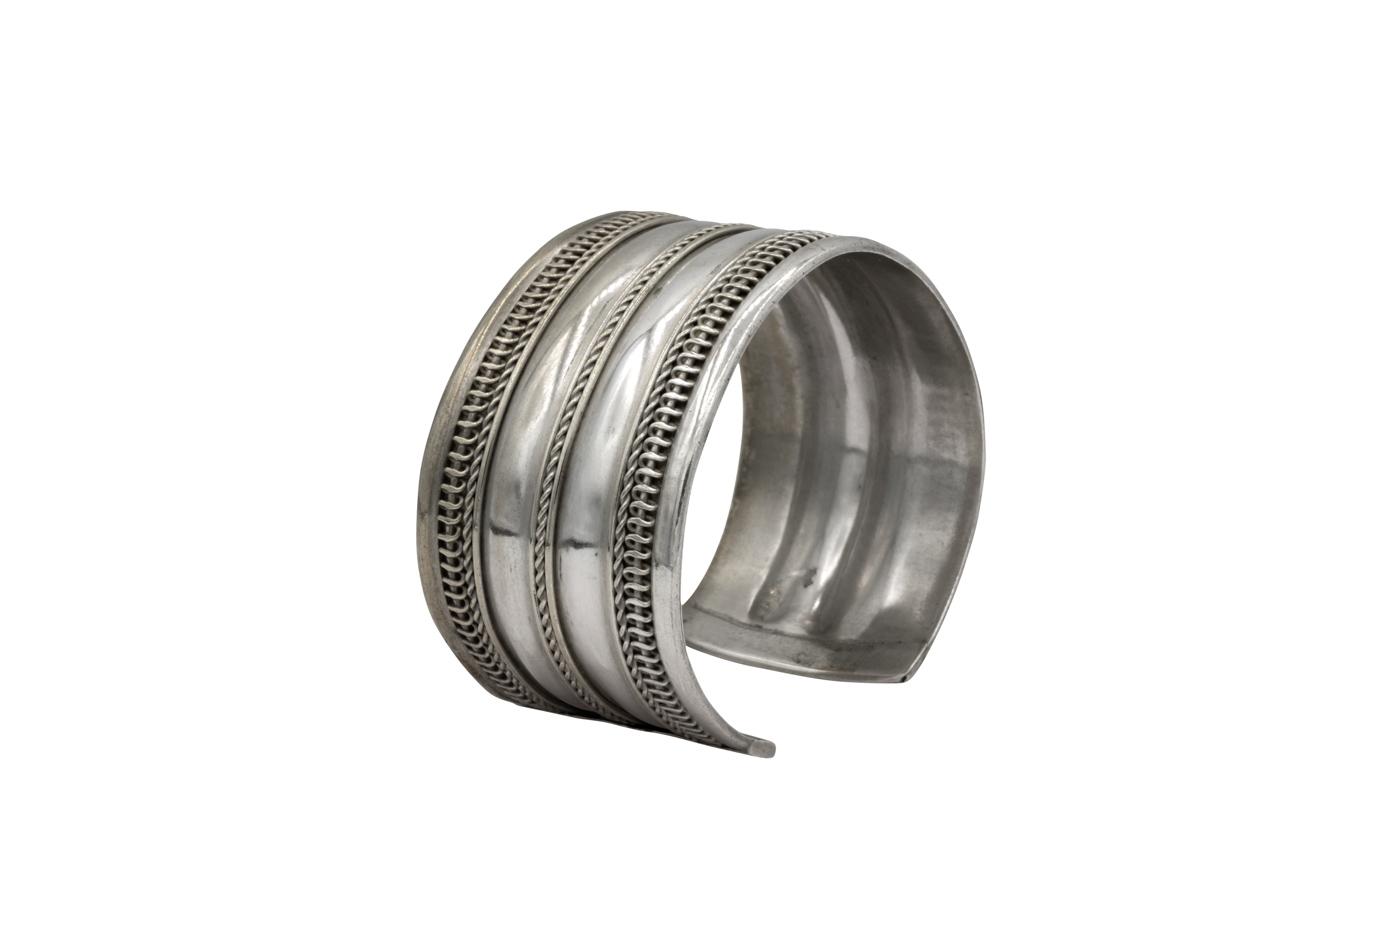 Thai bracelet in antique silver